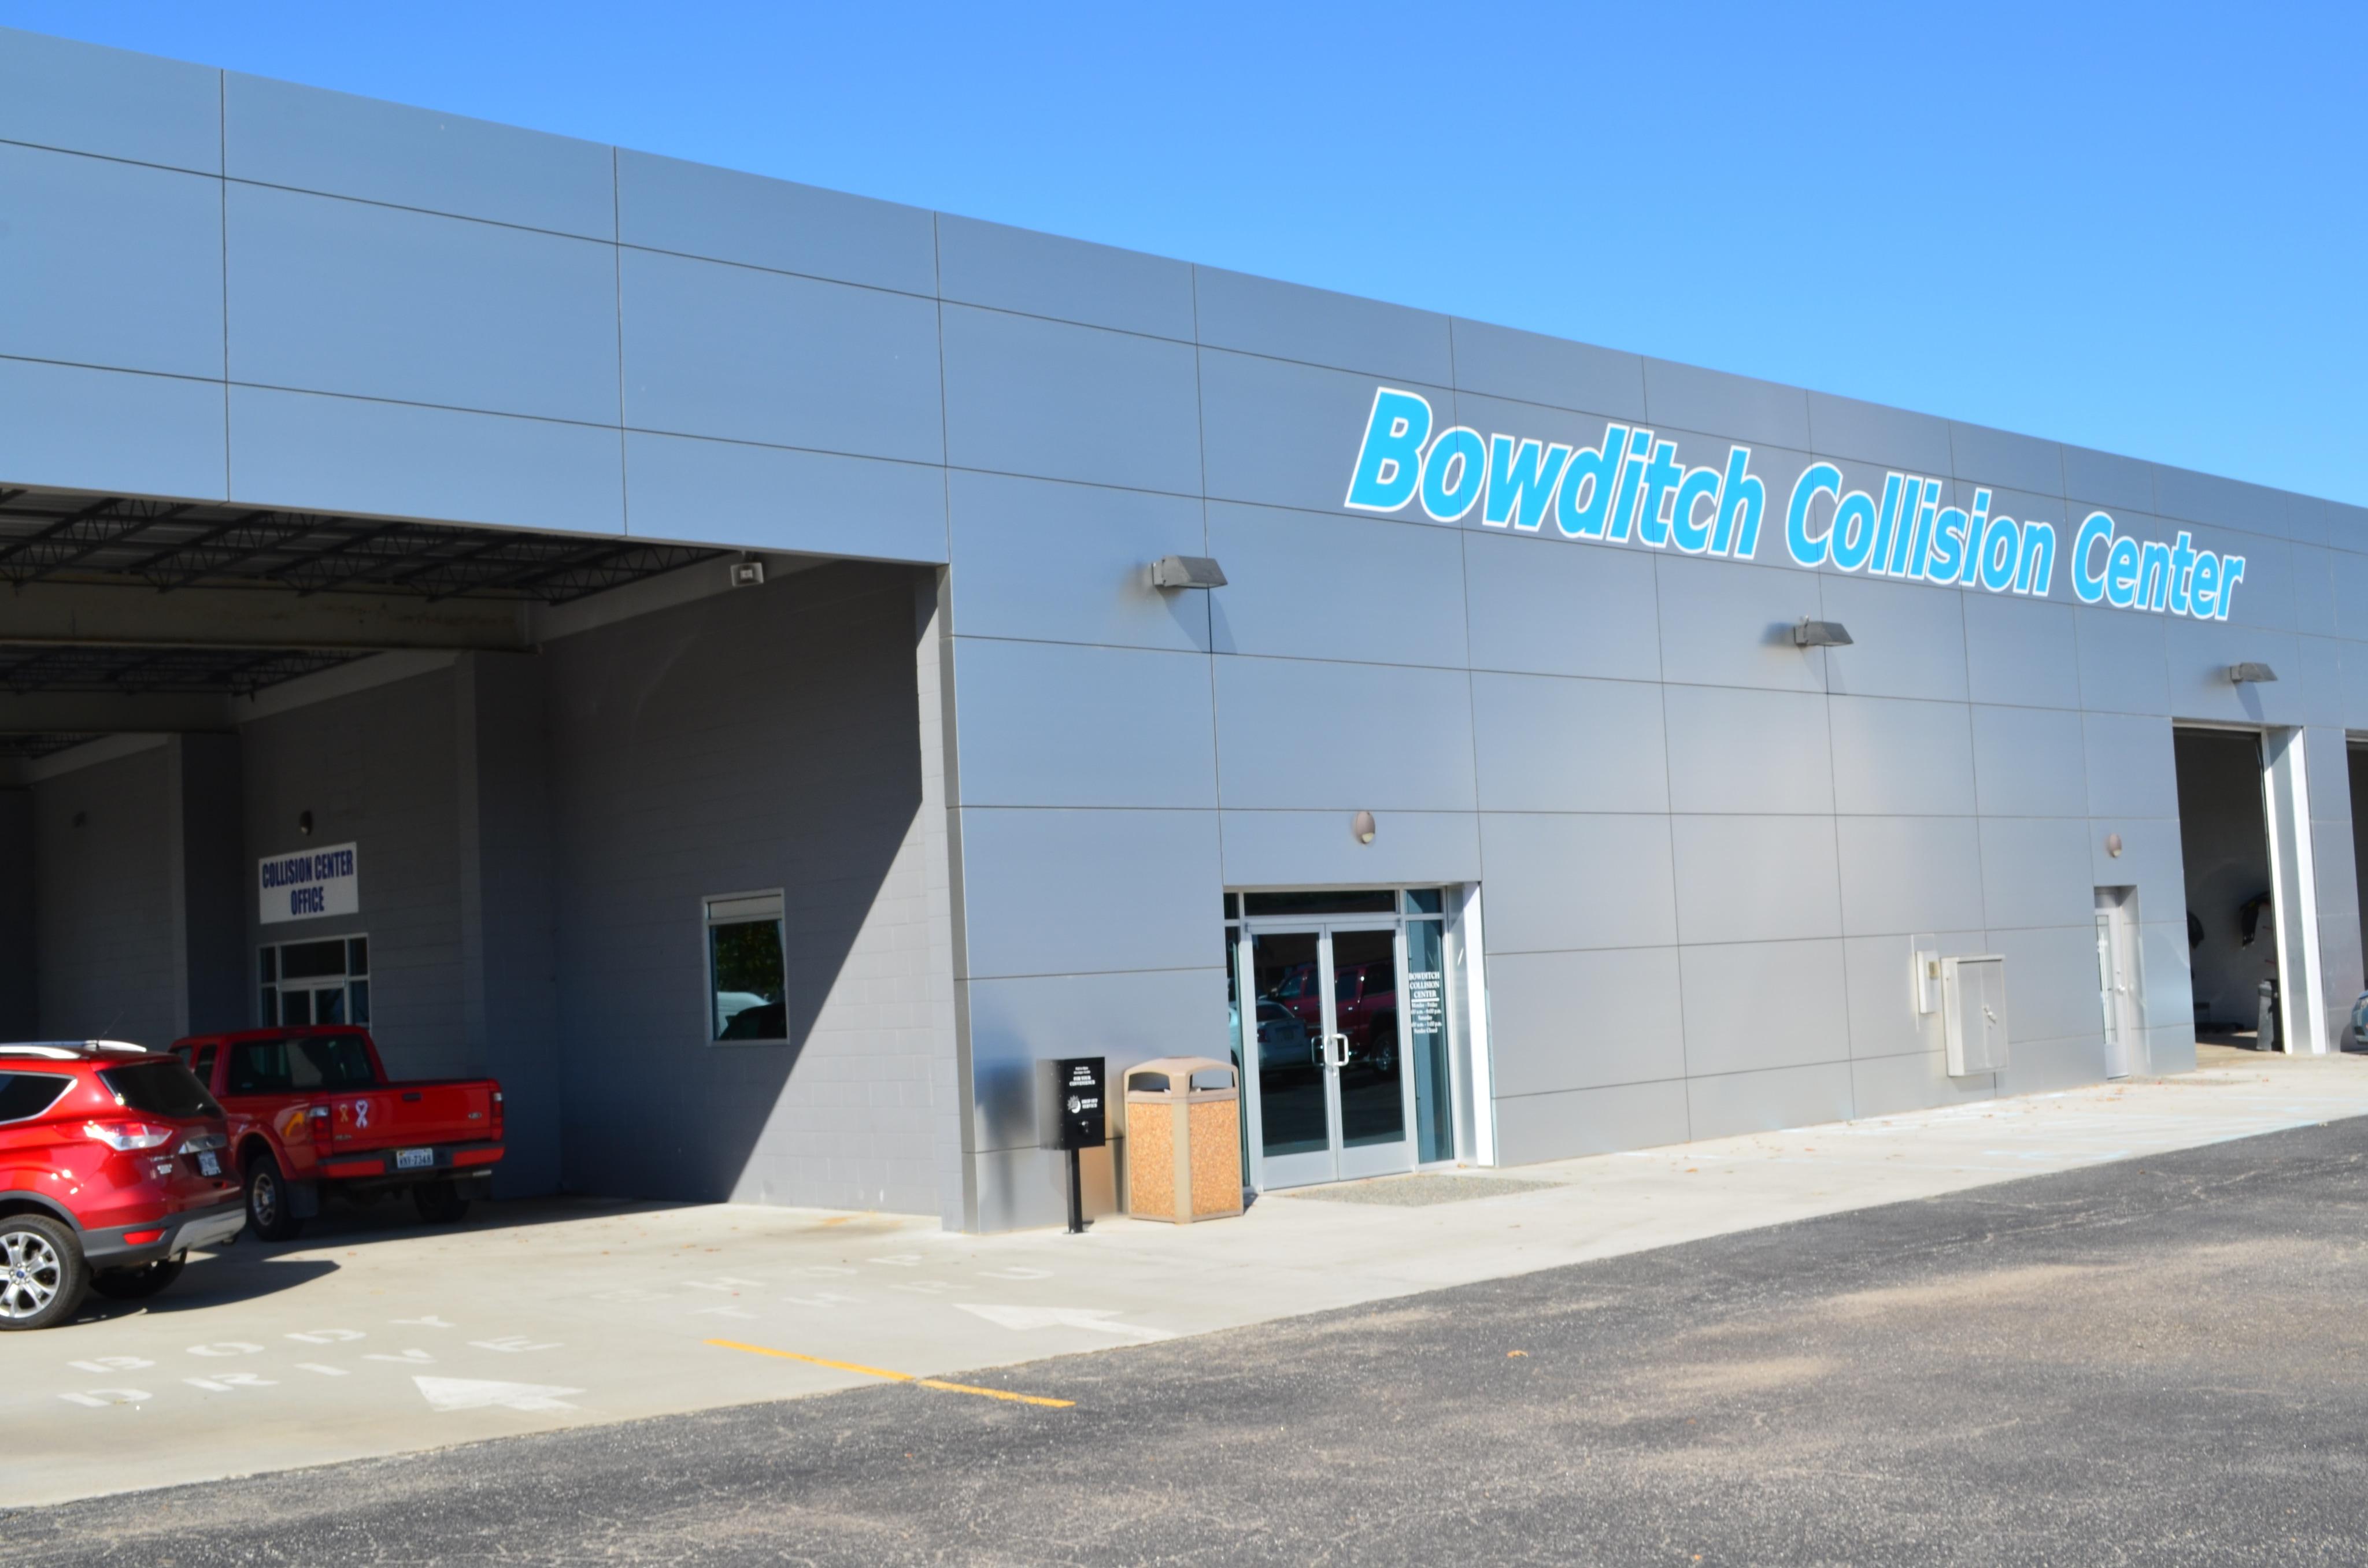 bowditch ford inc ford dealership in newport news va autos post. Black Bedroom Furniture Sets. Home Design Ideas